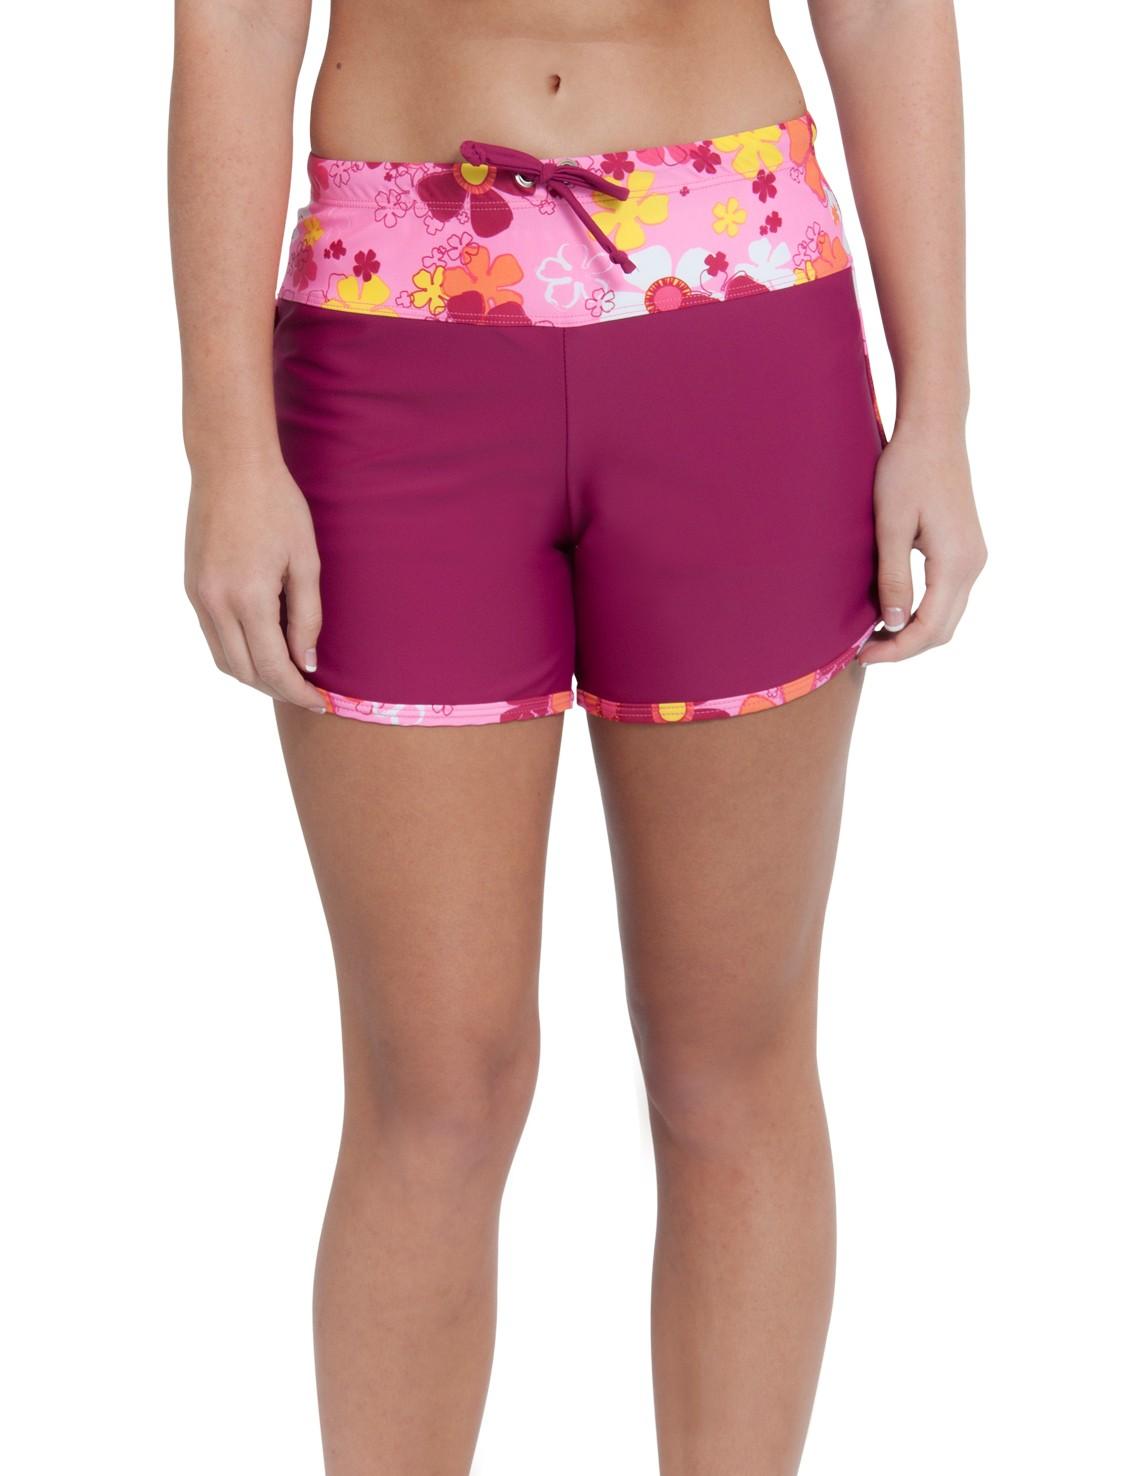 womens swim shorts womenu0027s swim shorts - daisy pink WSMWDUM